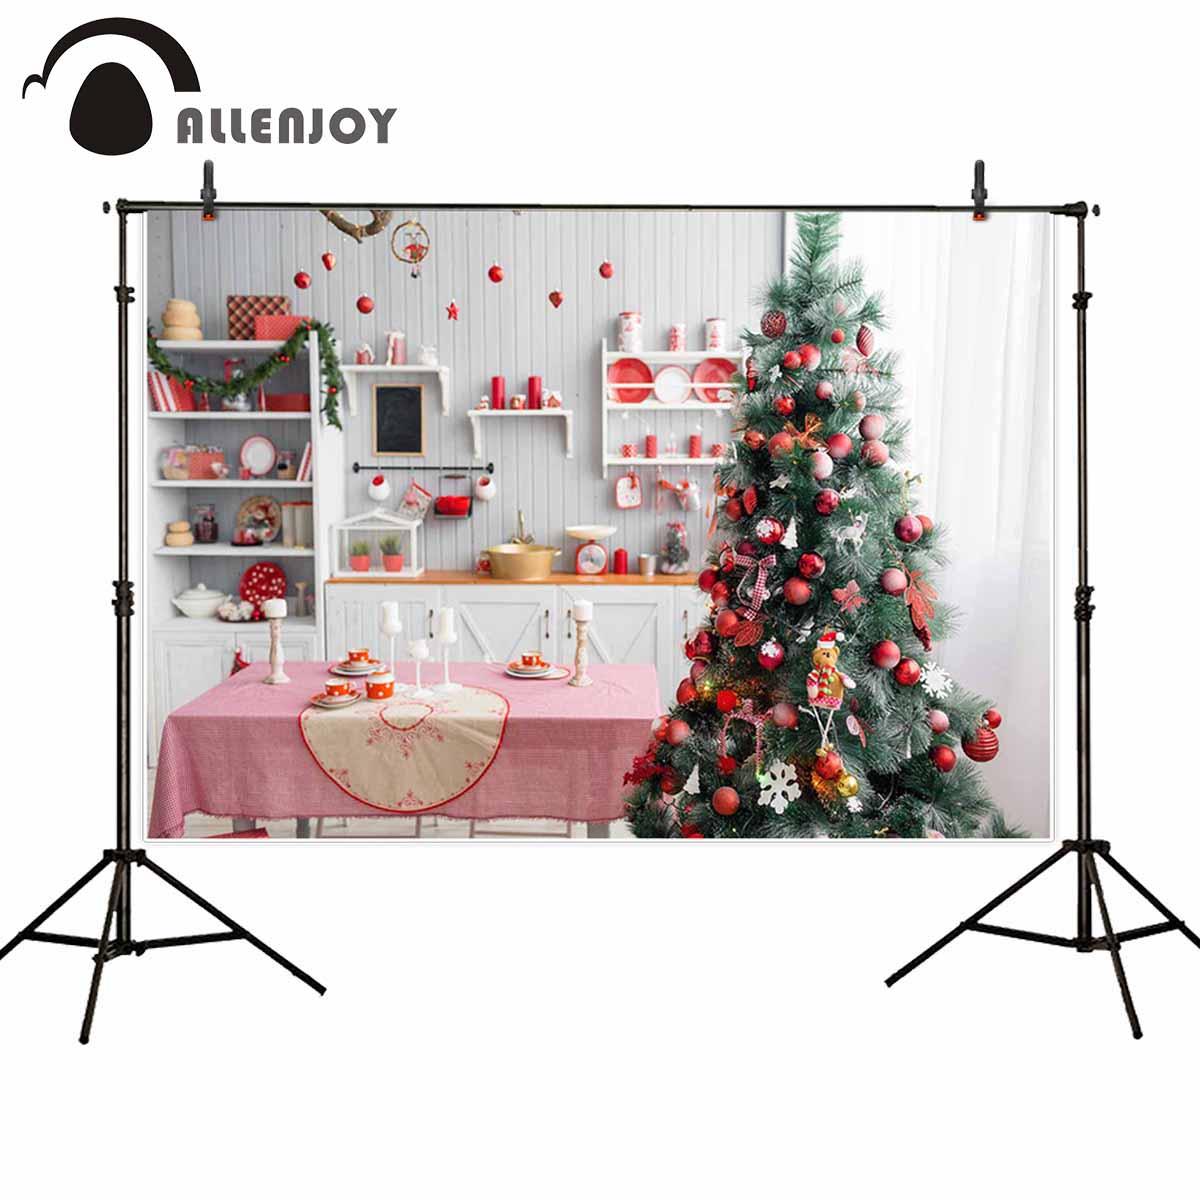 Allenjoy Kerst Keuken Fotografie Achtergrond Boom Hout Candy Bar Achtergrond Kinderen Photophone Photocall Indoor Decoratie